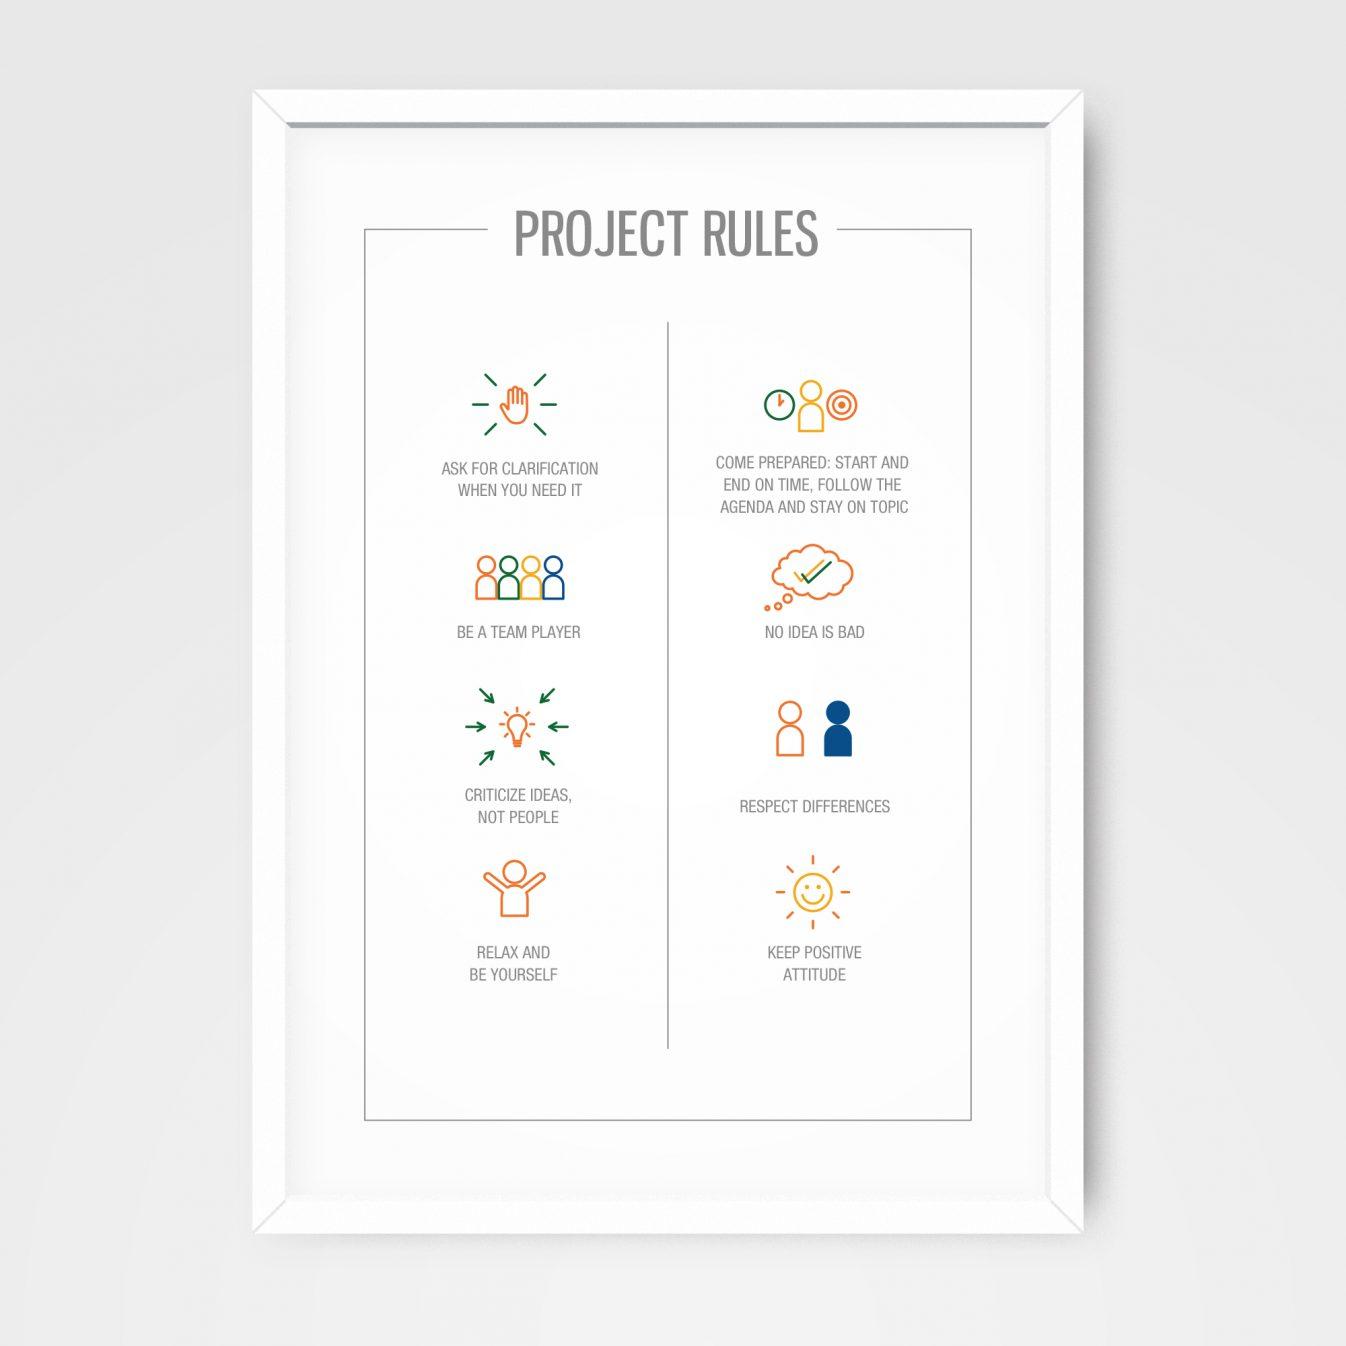 BancaIntesa_GraphicDesign_Shonski_Pictograms_Poster_ProjectRules2